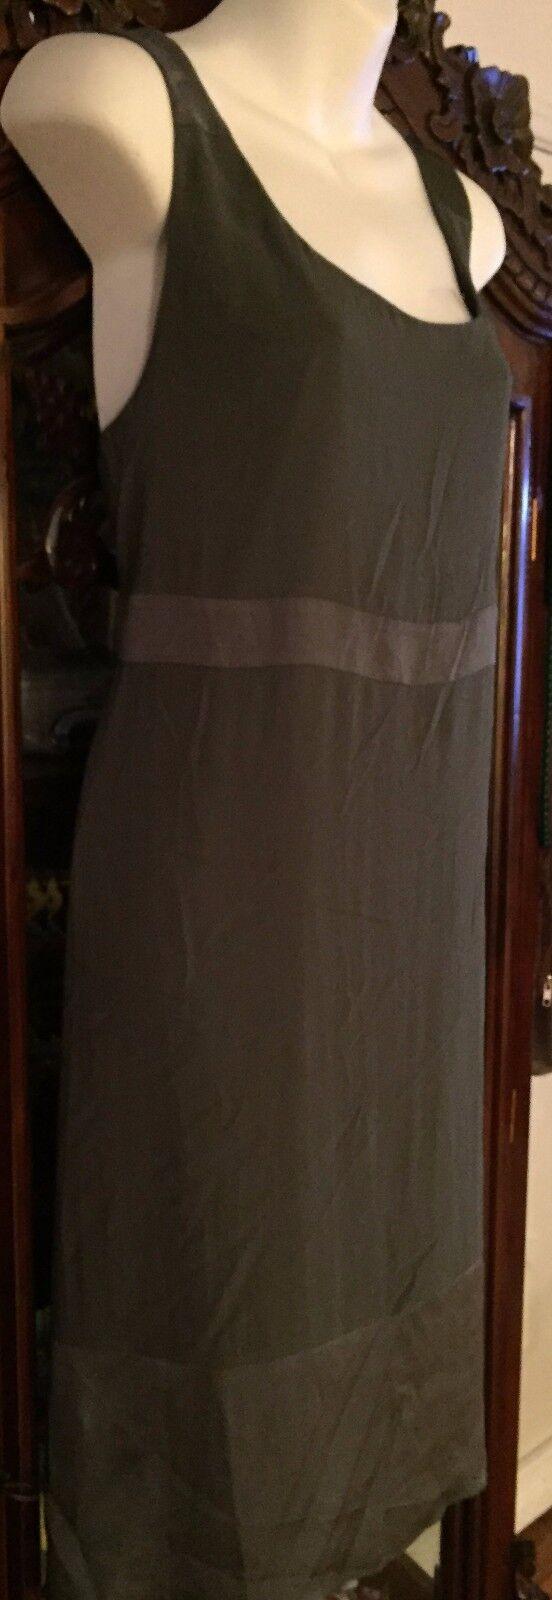 NEW DKNY Two Tone Fatigue Green Sleeveless Dress Sz. L